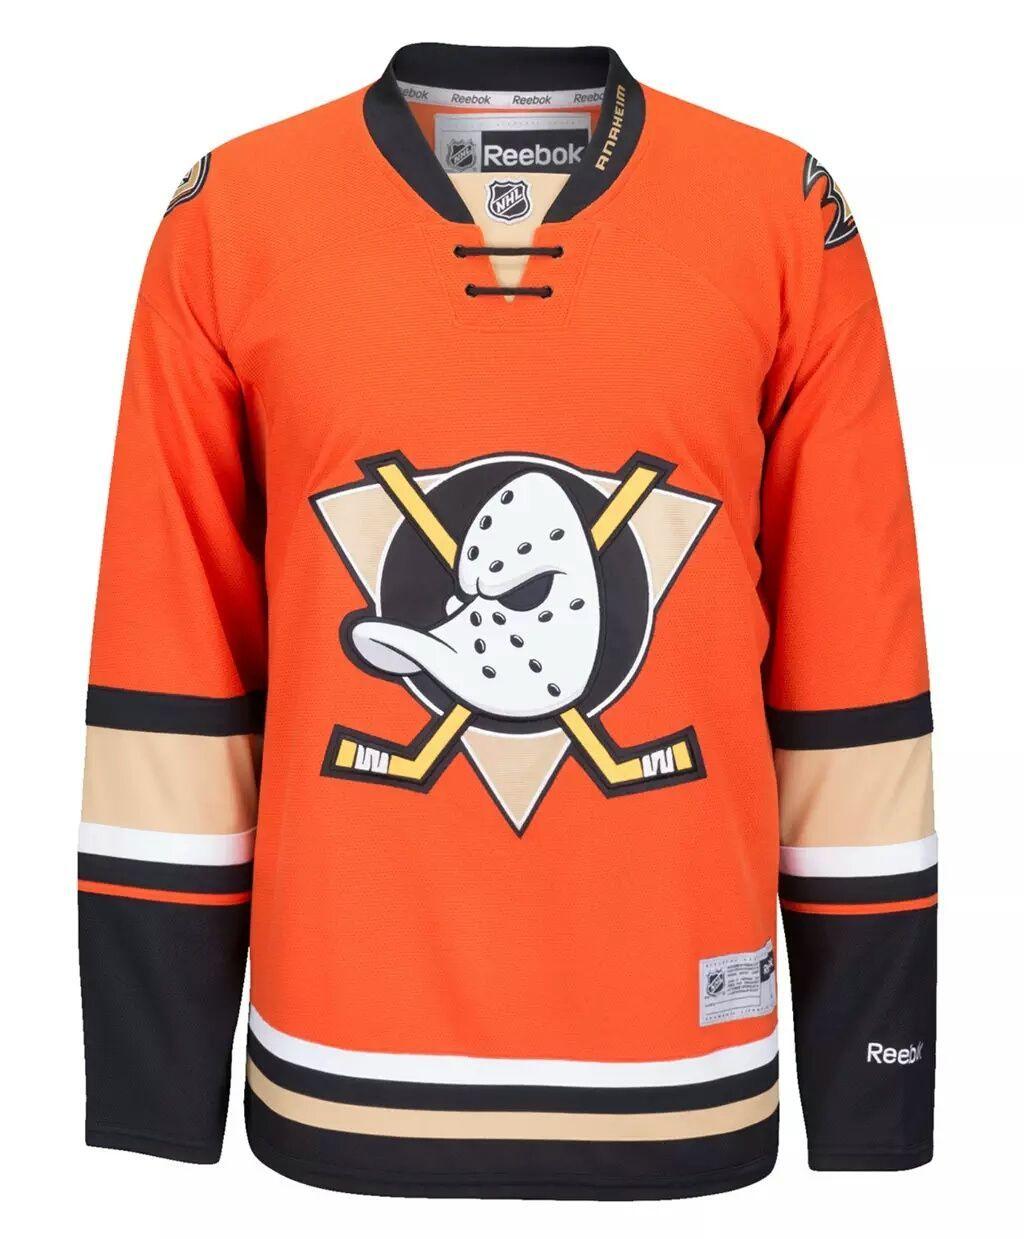 The Anaheim Ducks 2015 alternate jersey db195240d